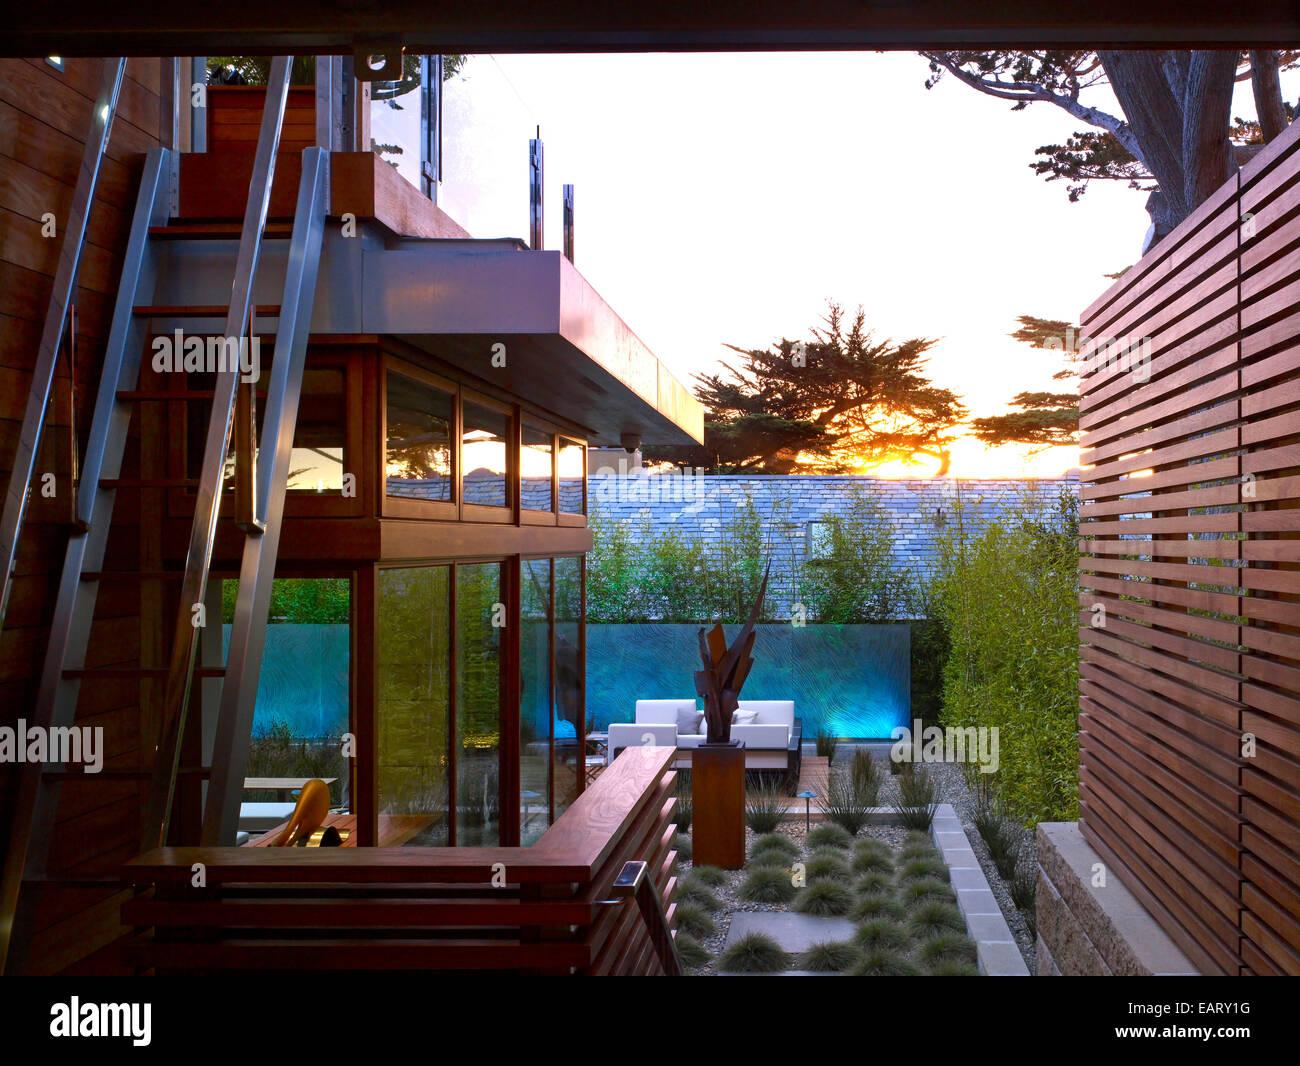 Exterior Of Modern House And Garden, Odyssey House, Carmel, California, USA